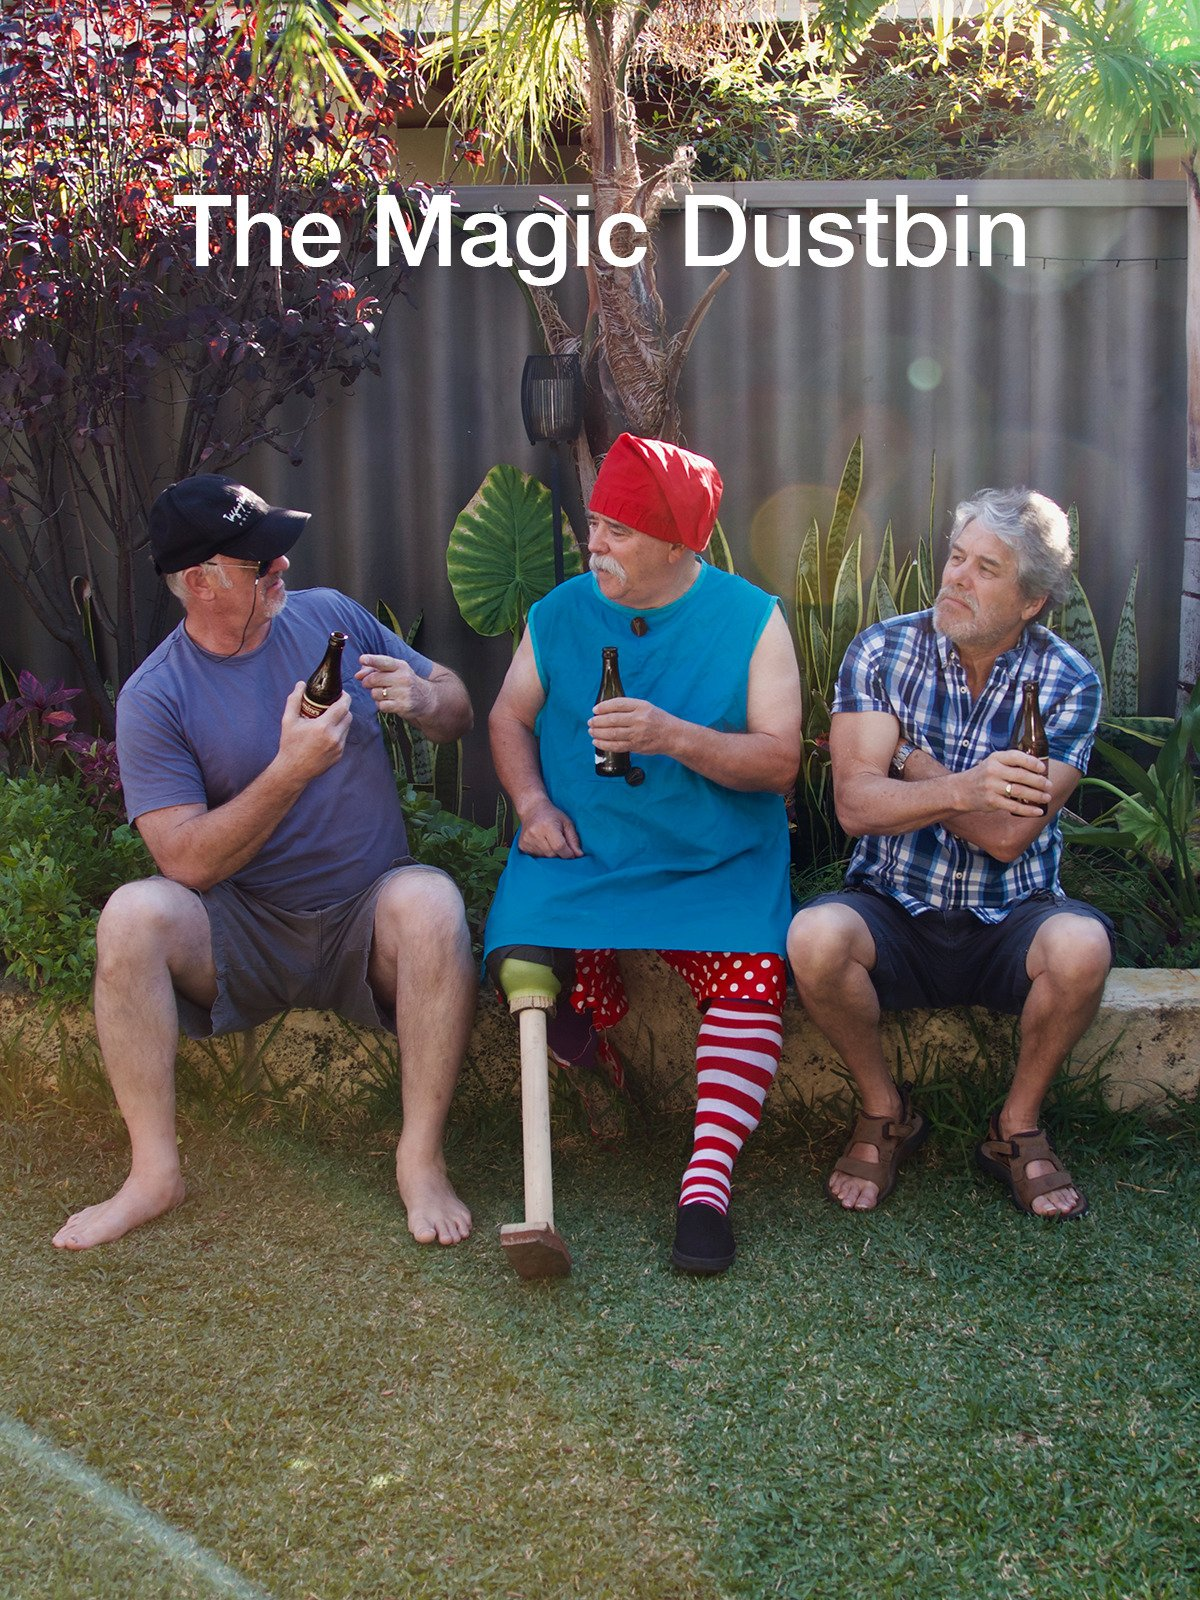 The Magic Dustbin